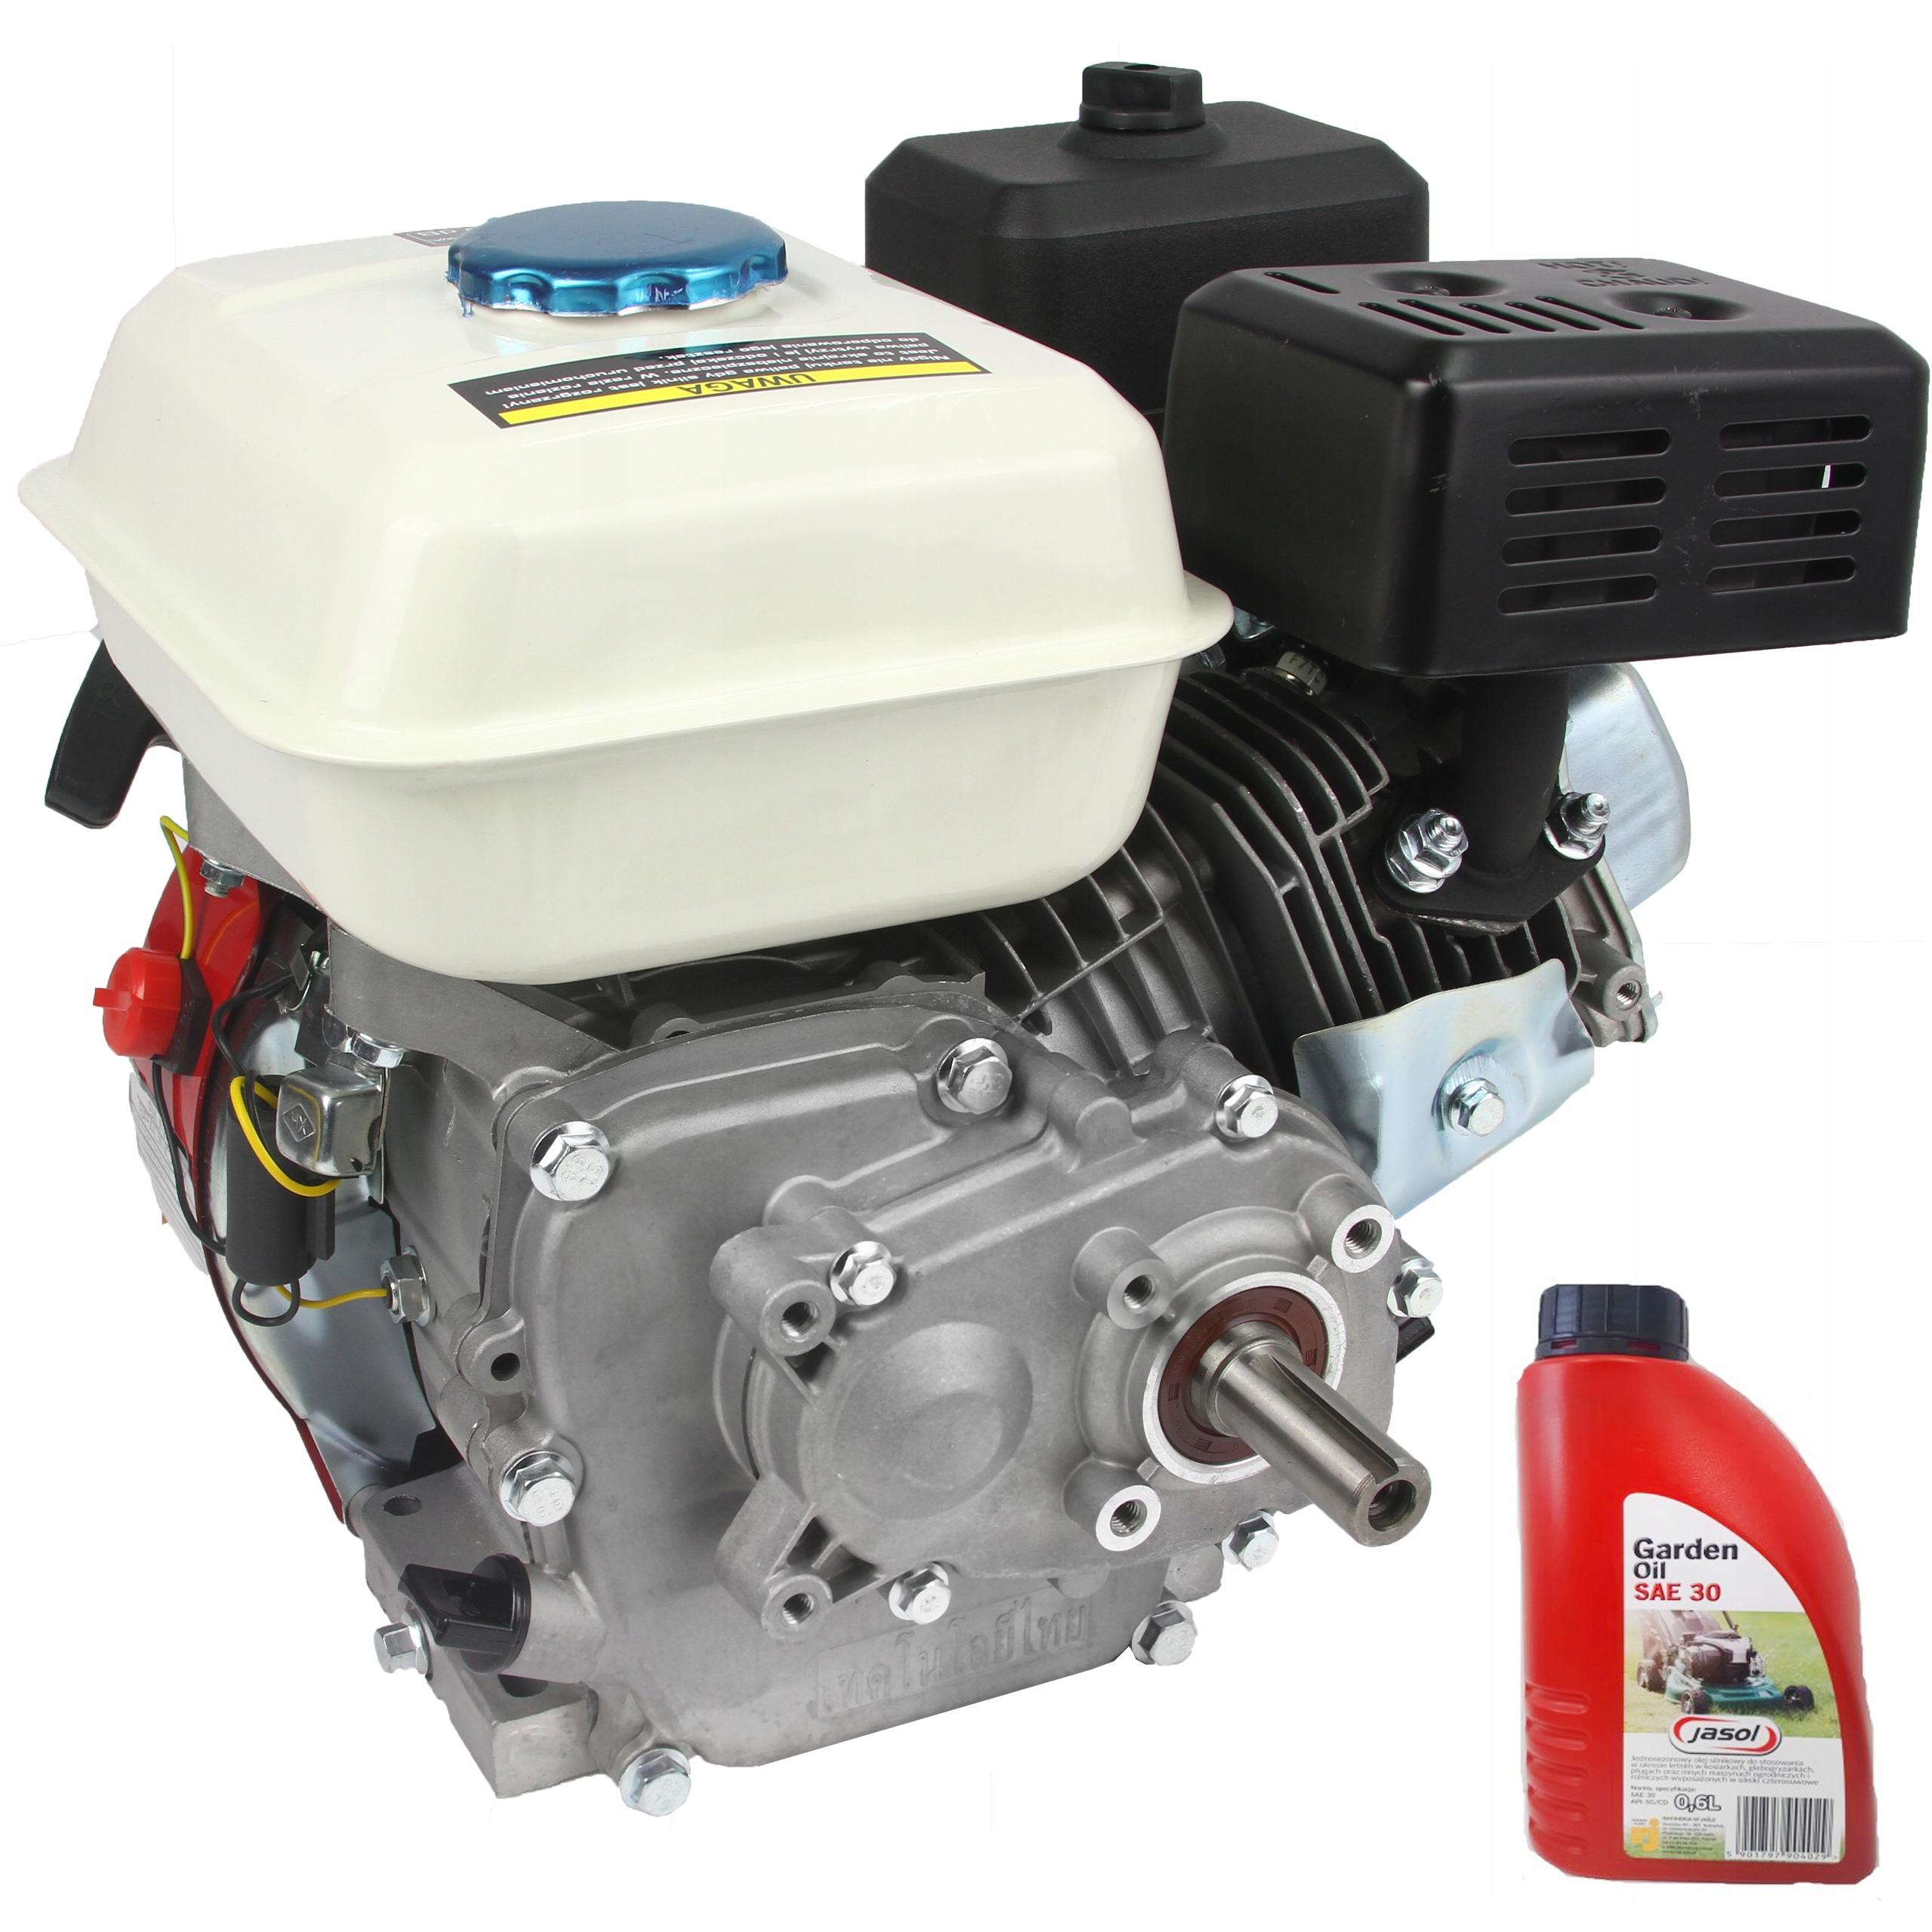 Silnik Spalinowy 1800 Obr Min Gx 160 Reduktor 1 2 9201702884 Allegro Pl